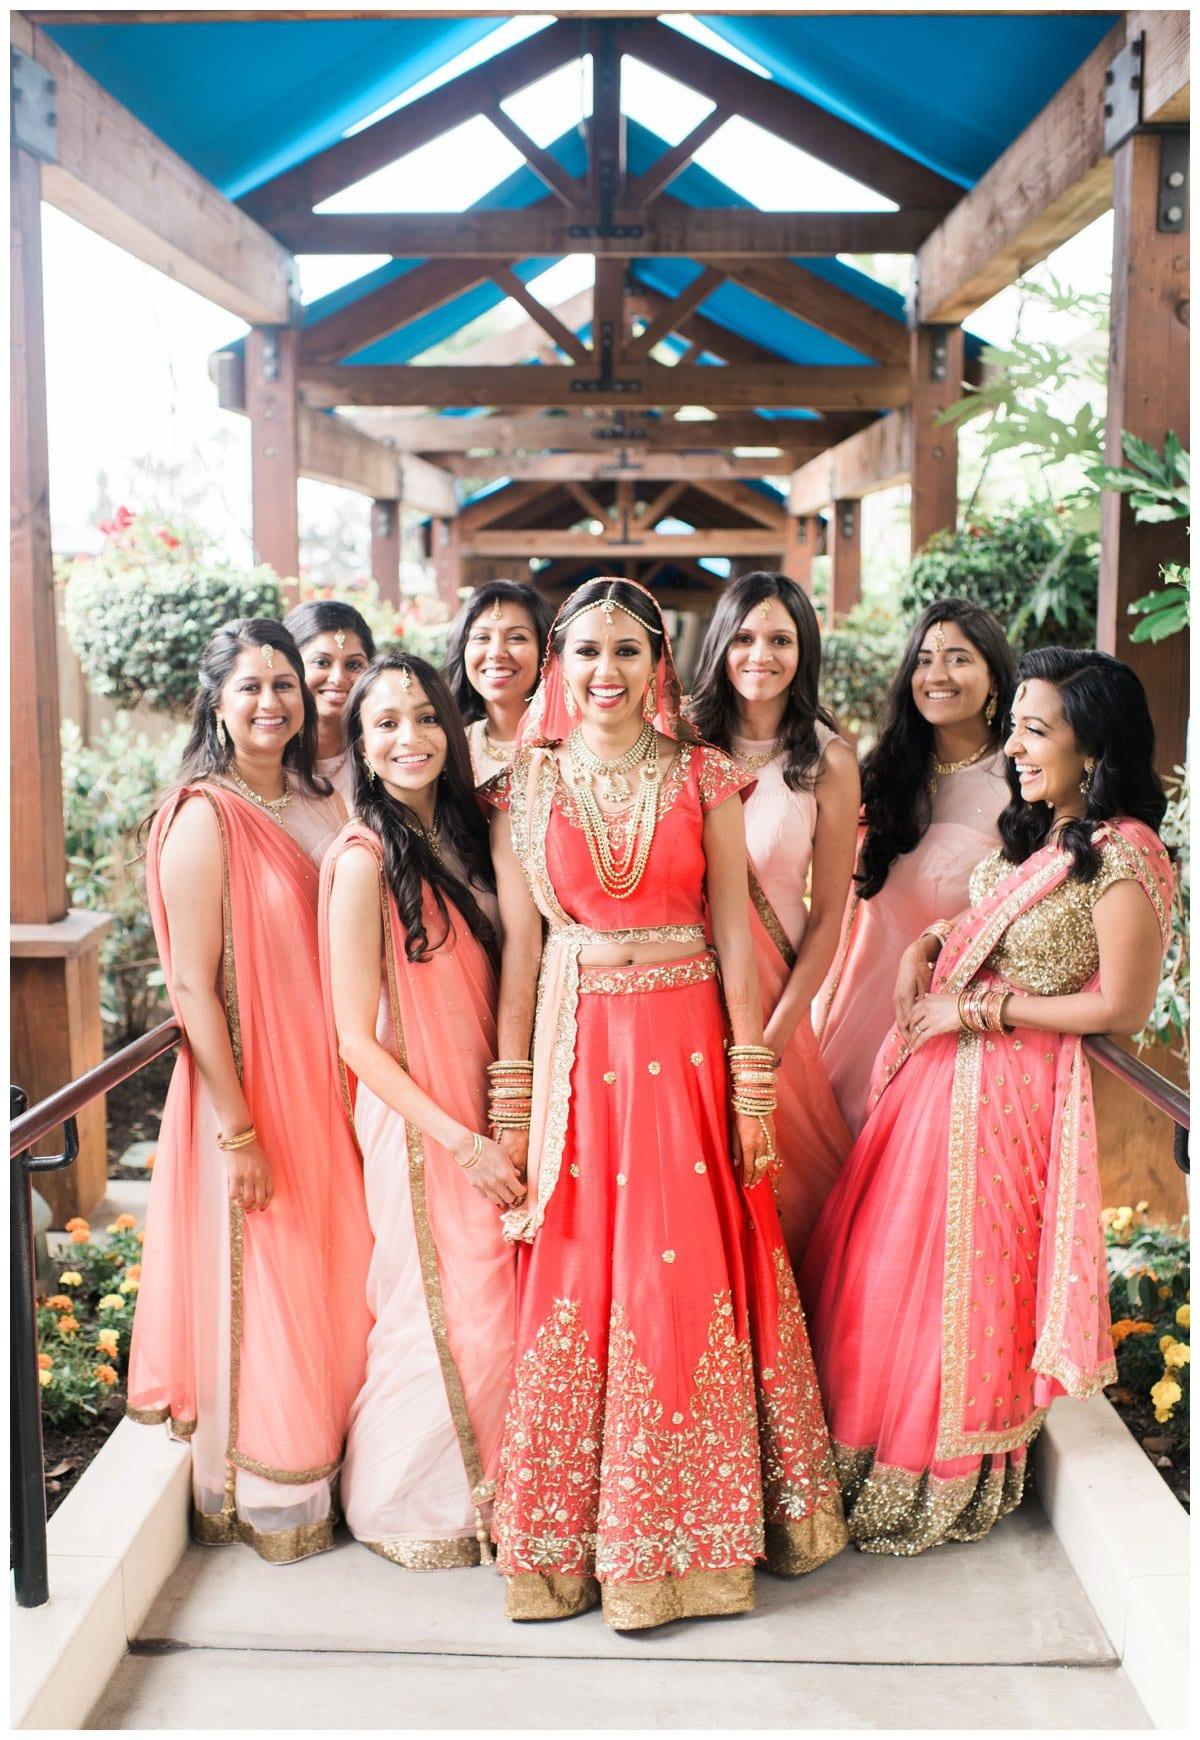 Hotel-Irvine-Indian-Wedding-Carissa-Woo-Photography_0009.jpg